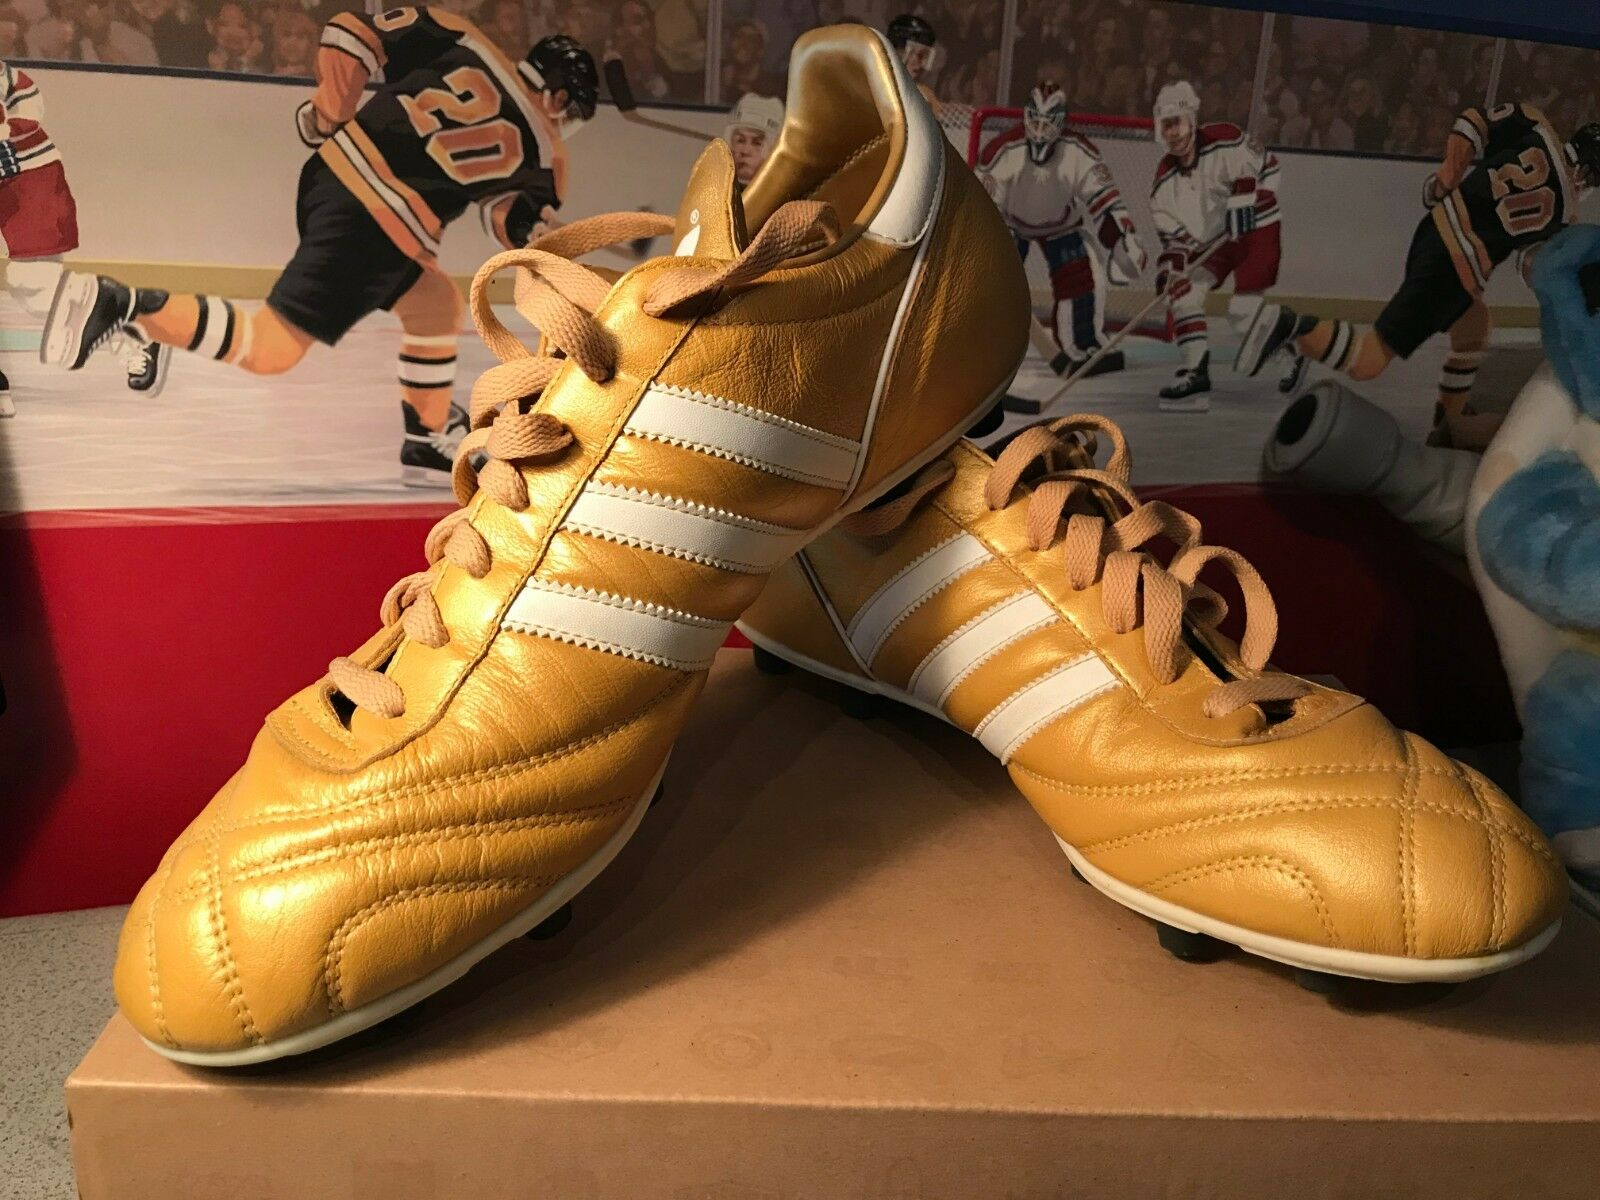 New Gold Adidas Profi Soccer Cleats